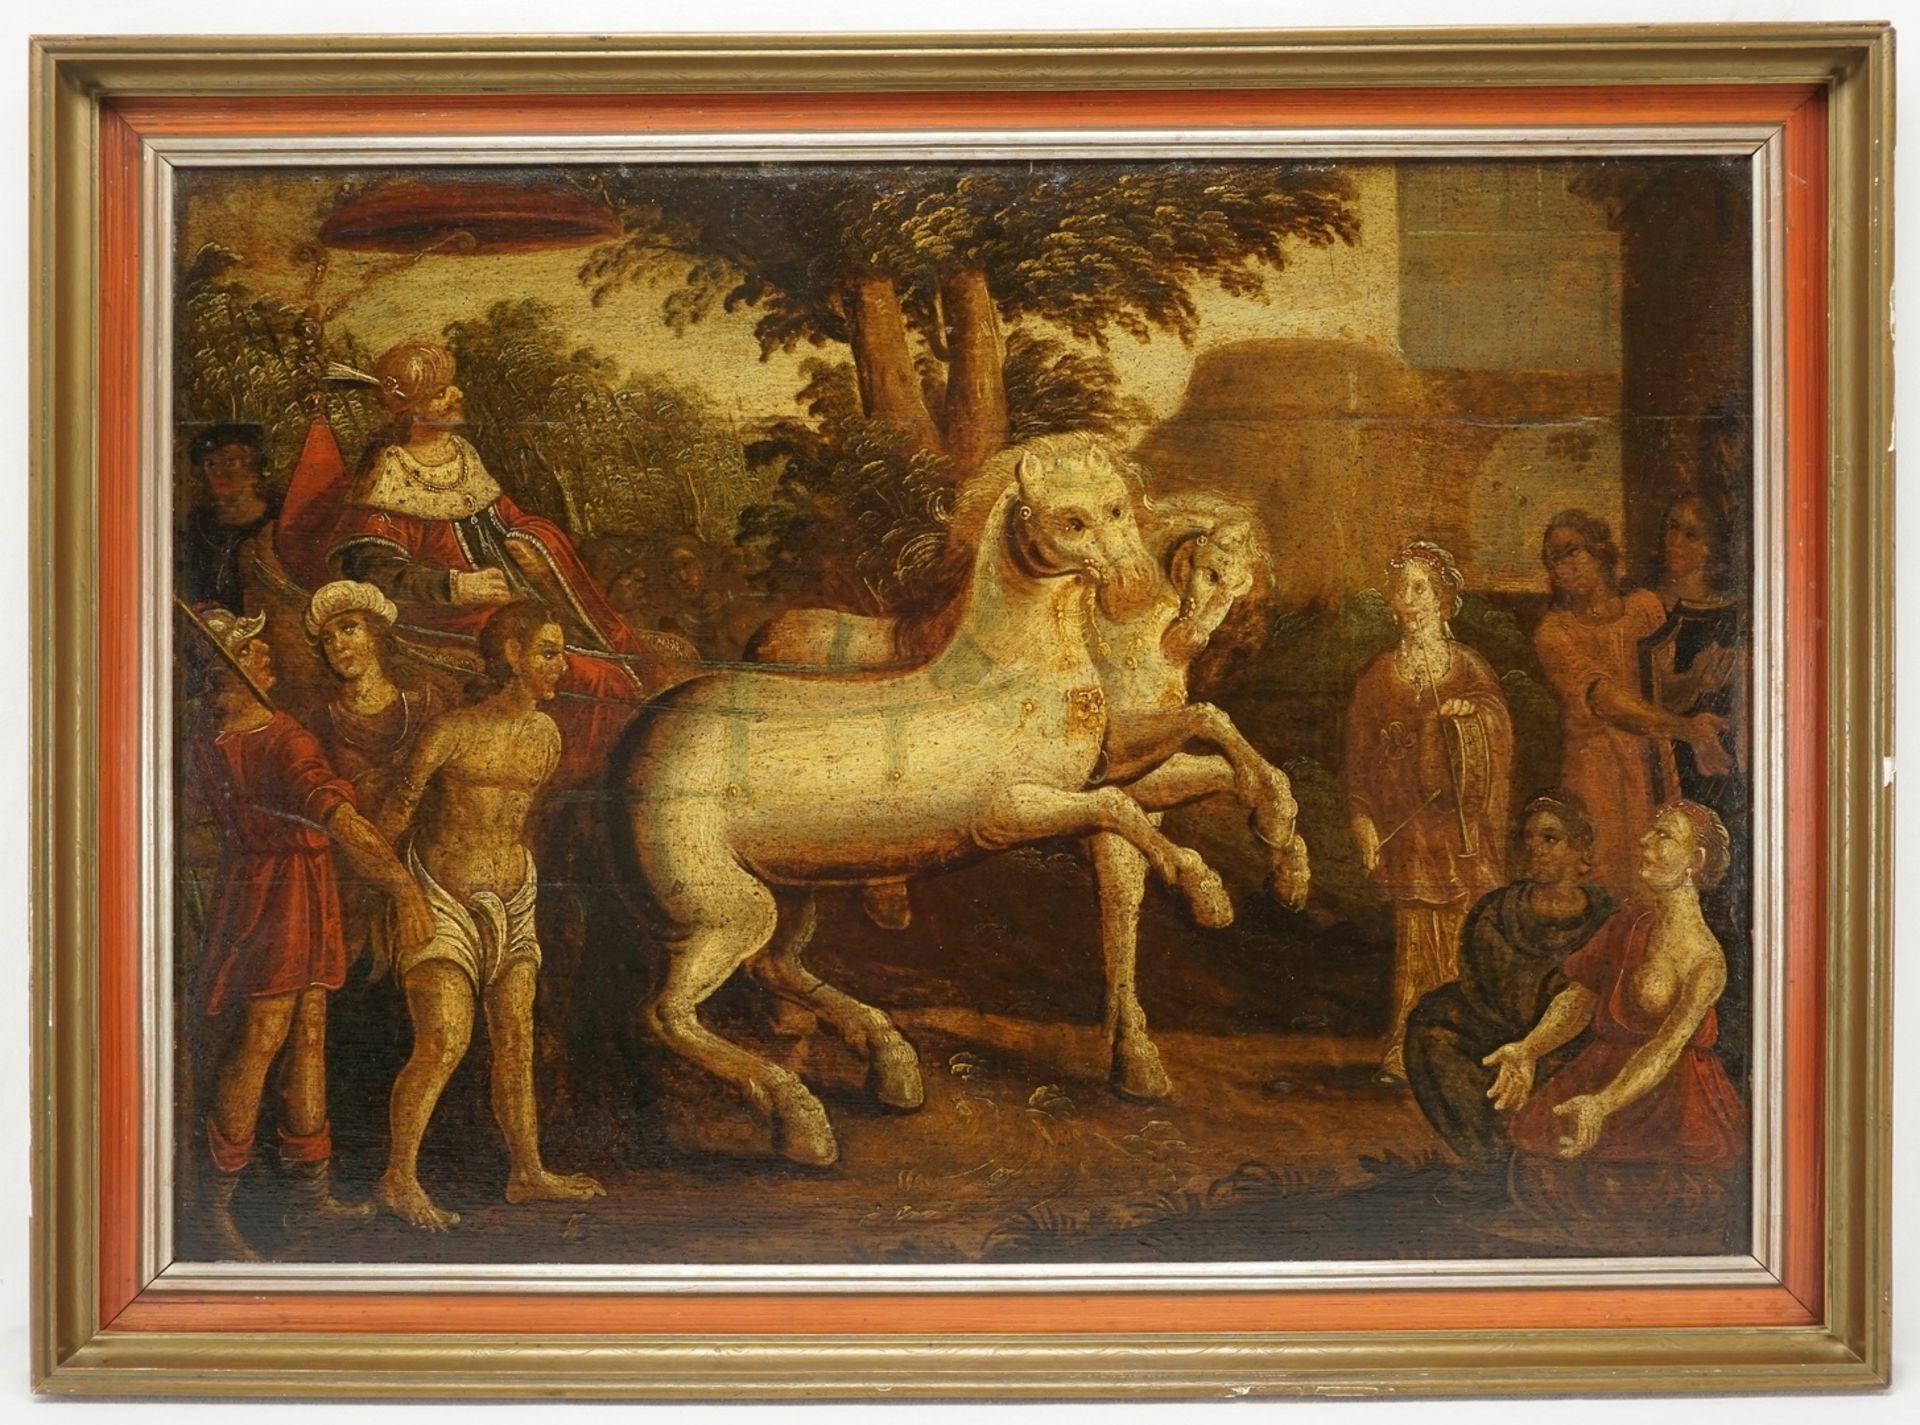 Unbekannter Maler des Barock, Triumphaler Zug König Davids - Bild 2 aus 3